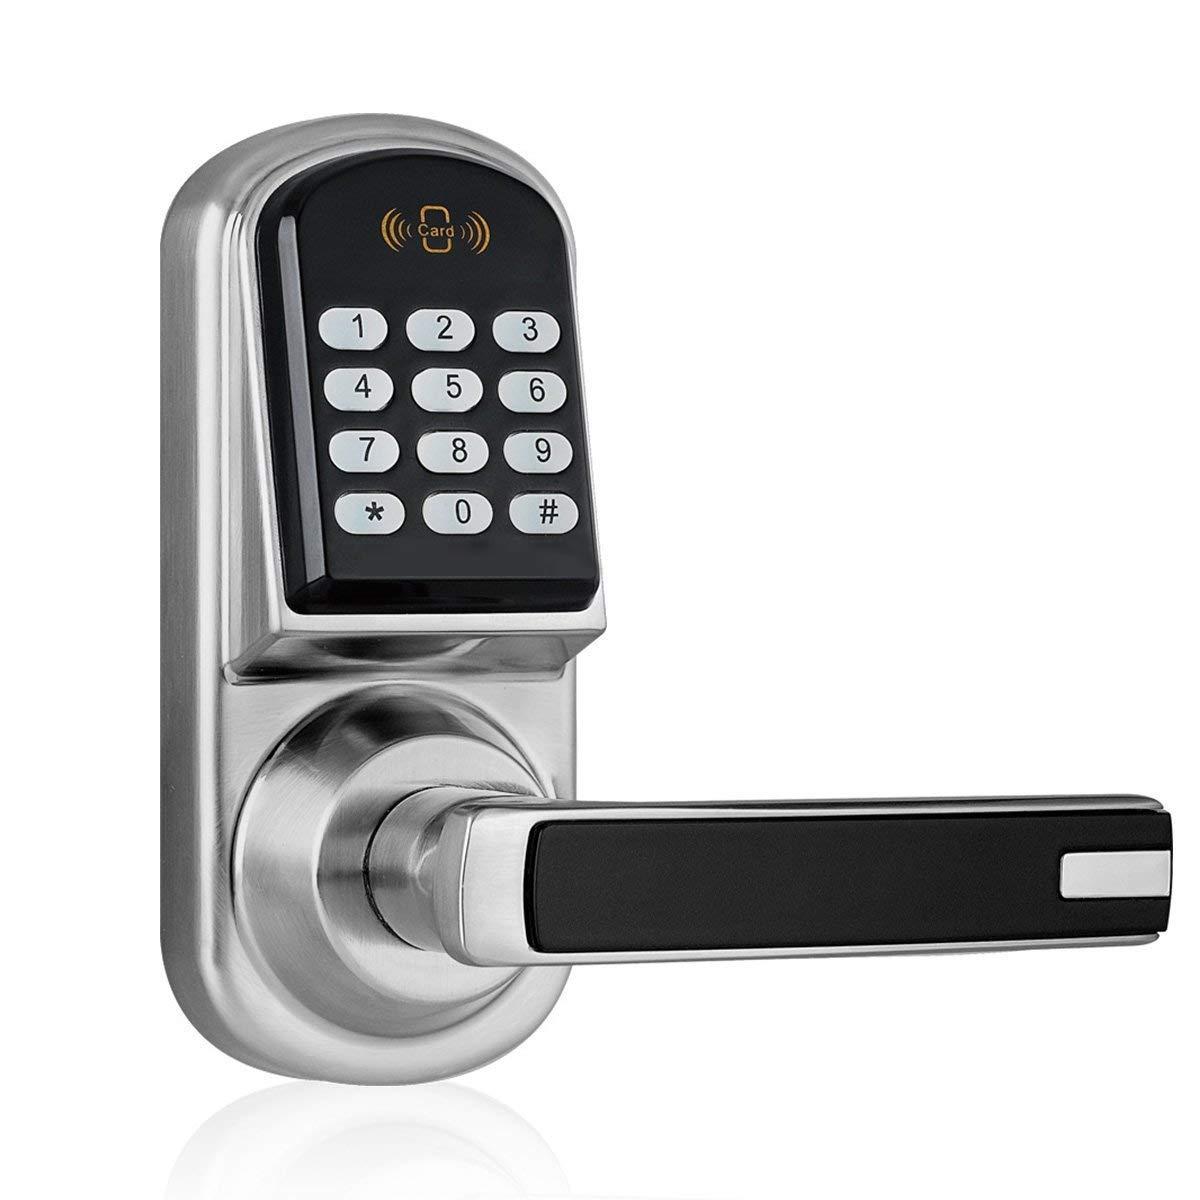 JASIT Keyless Smart Door Lock Keypad Digital with Code Mifare Card and Key Locking for Home Office Security Locks,Handle Direction Reversible